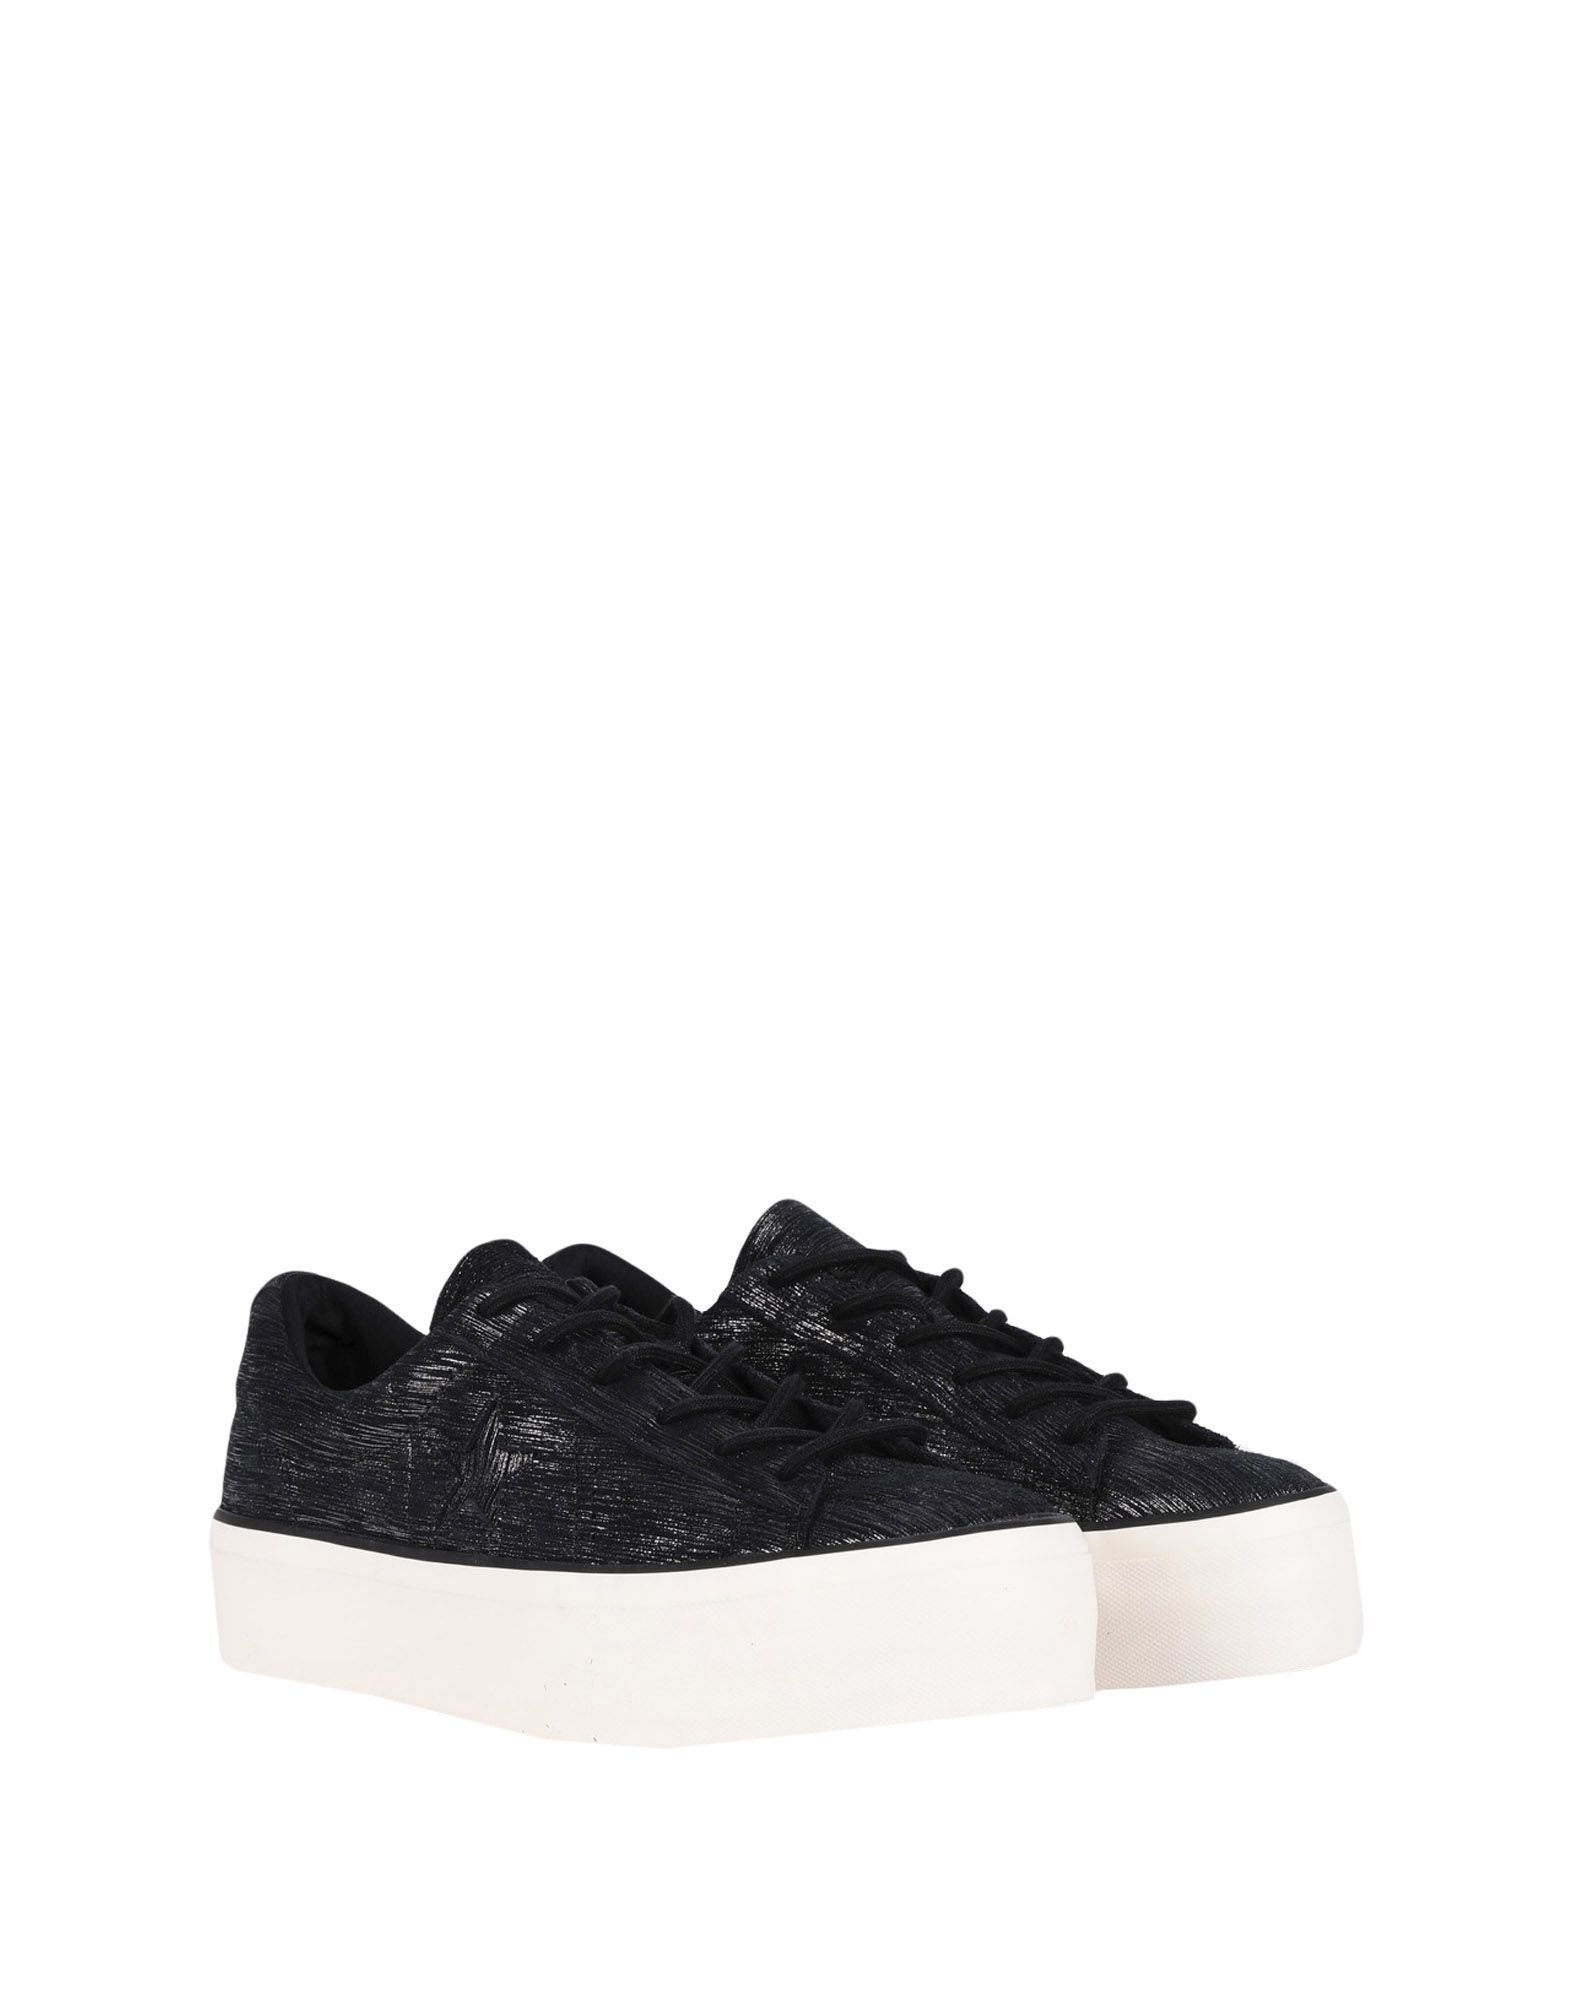 Converse Converse Converse One Star One Star Platform - Sneakers - Women Converse One Star Sneakers online on  United Kingdom - 11551366RF ef915e